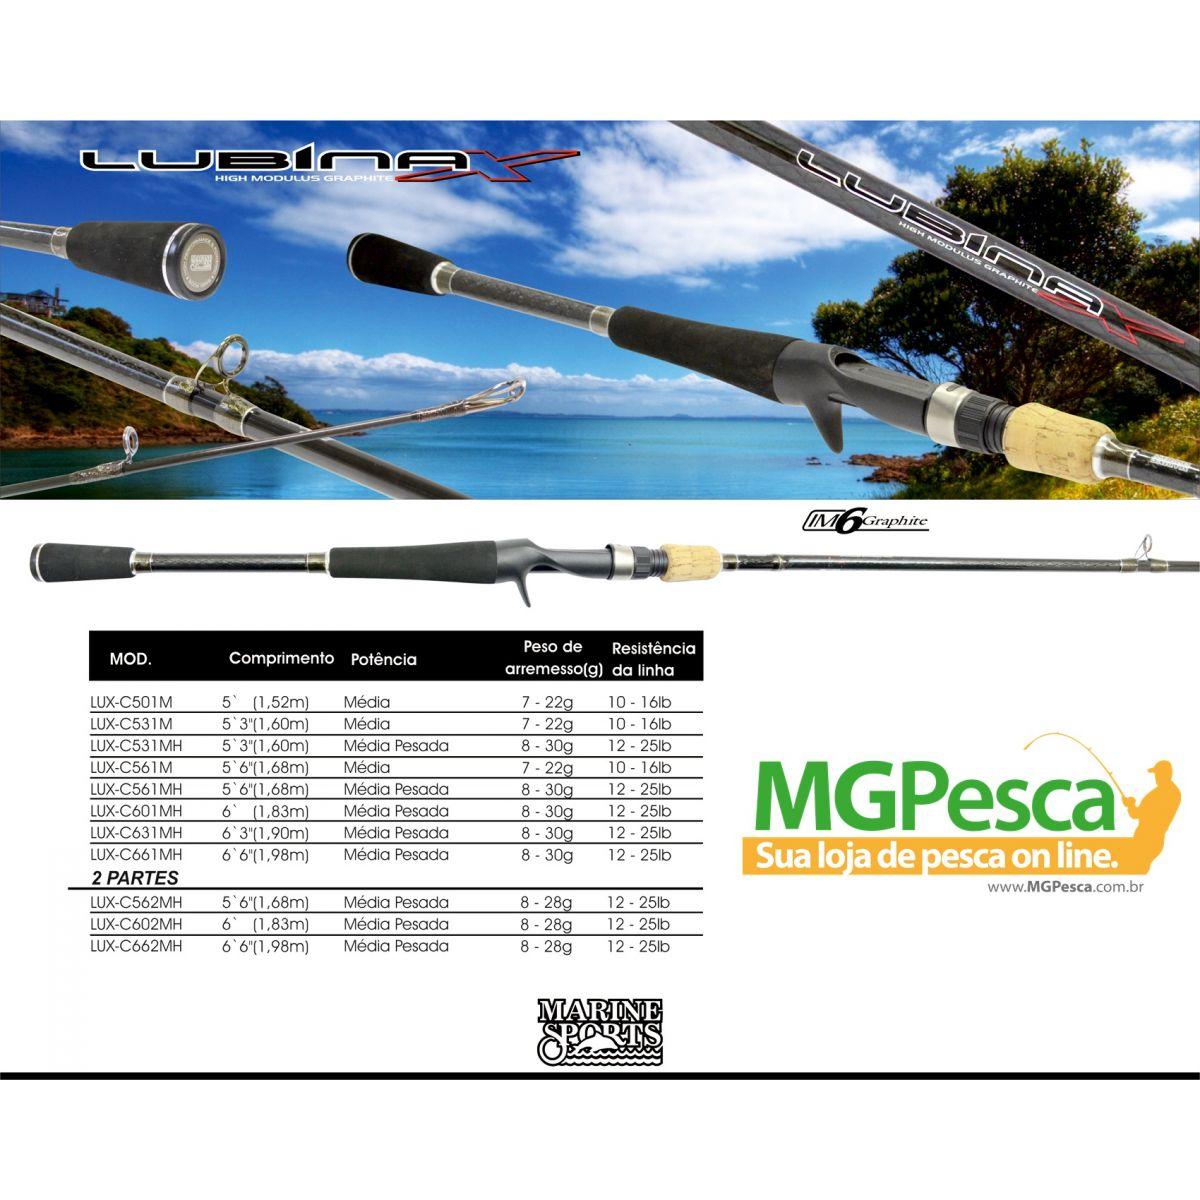 "Vara para carretilha Marine Sports Lubina X 6"" (1,83m) 25 Lbs - LUX-C601MH  - MGPesca"